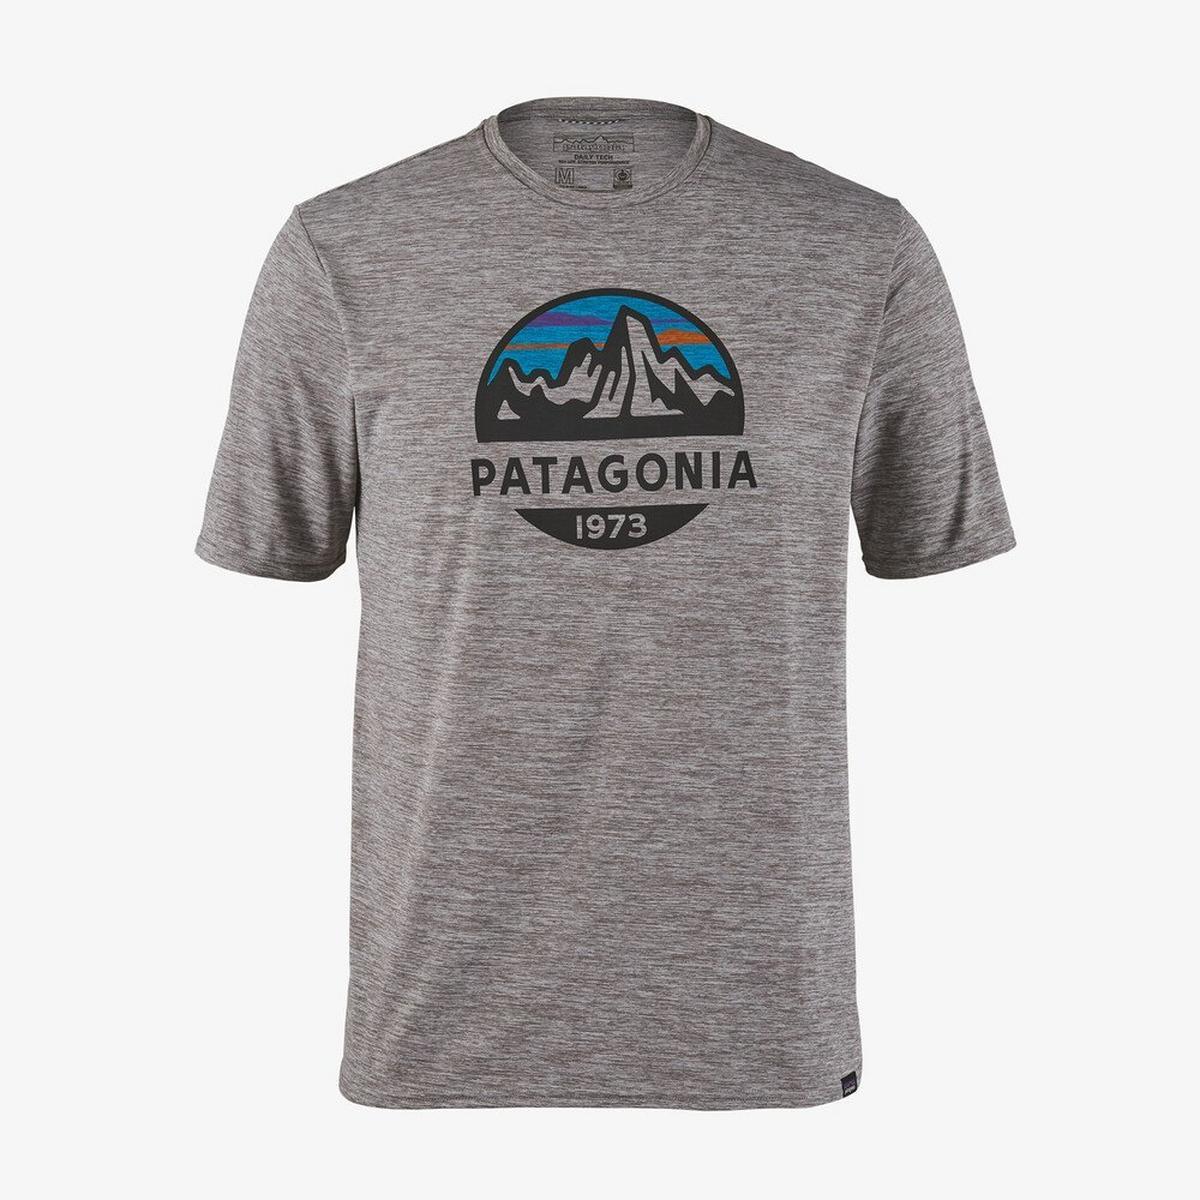 Patagonia Men's Patagonia Cap Cool Daily Graphic Shirt - Grey